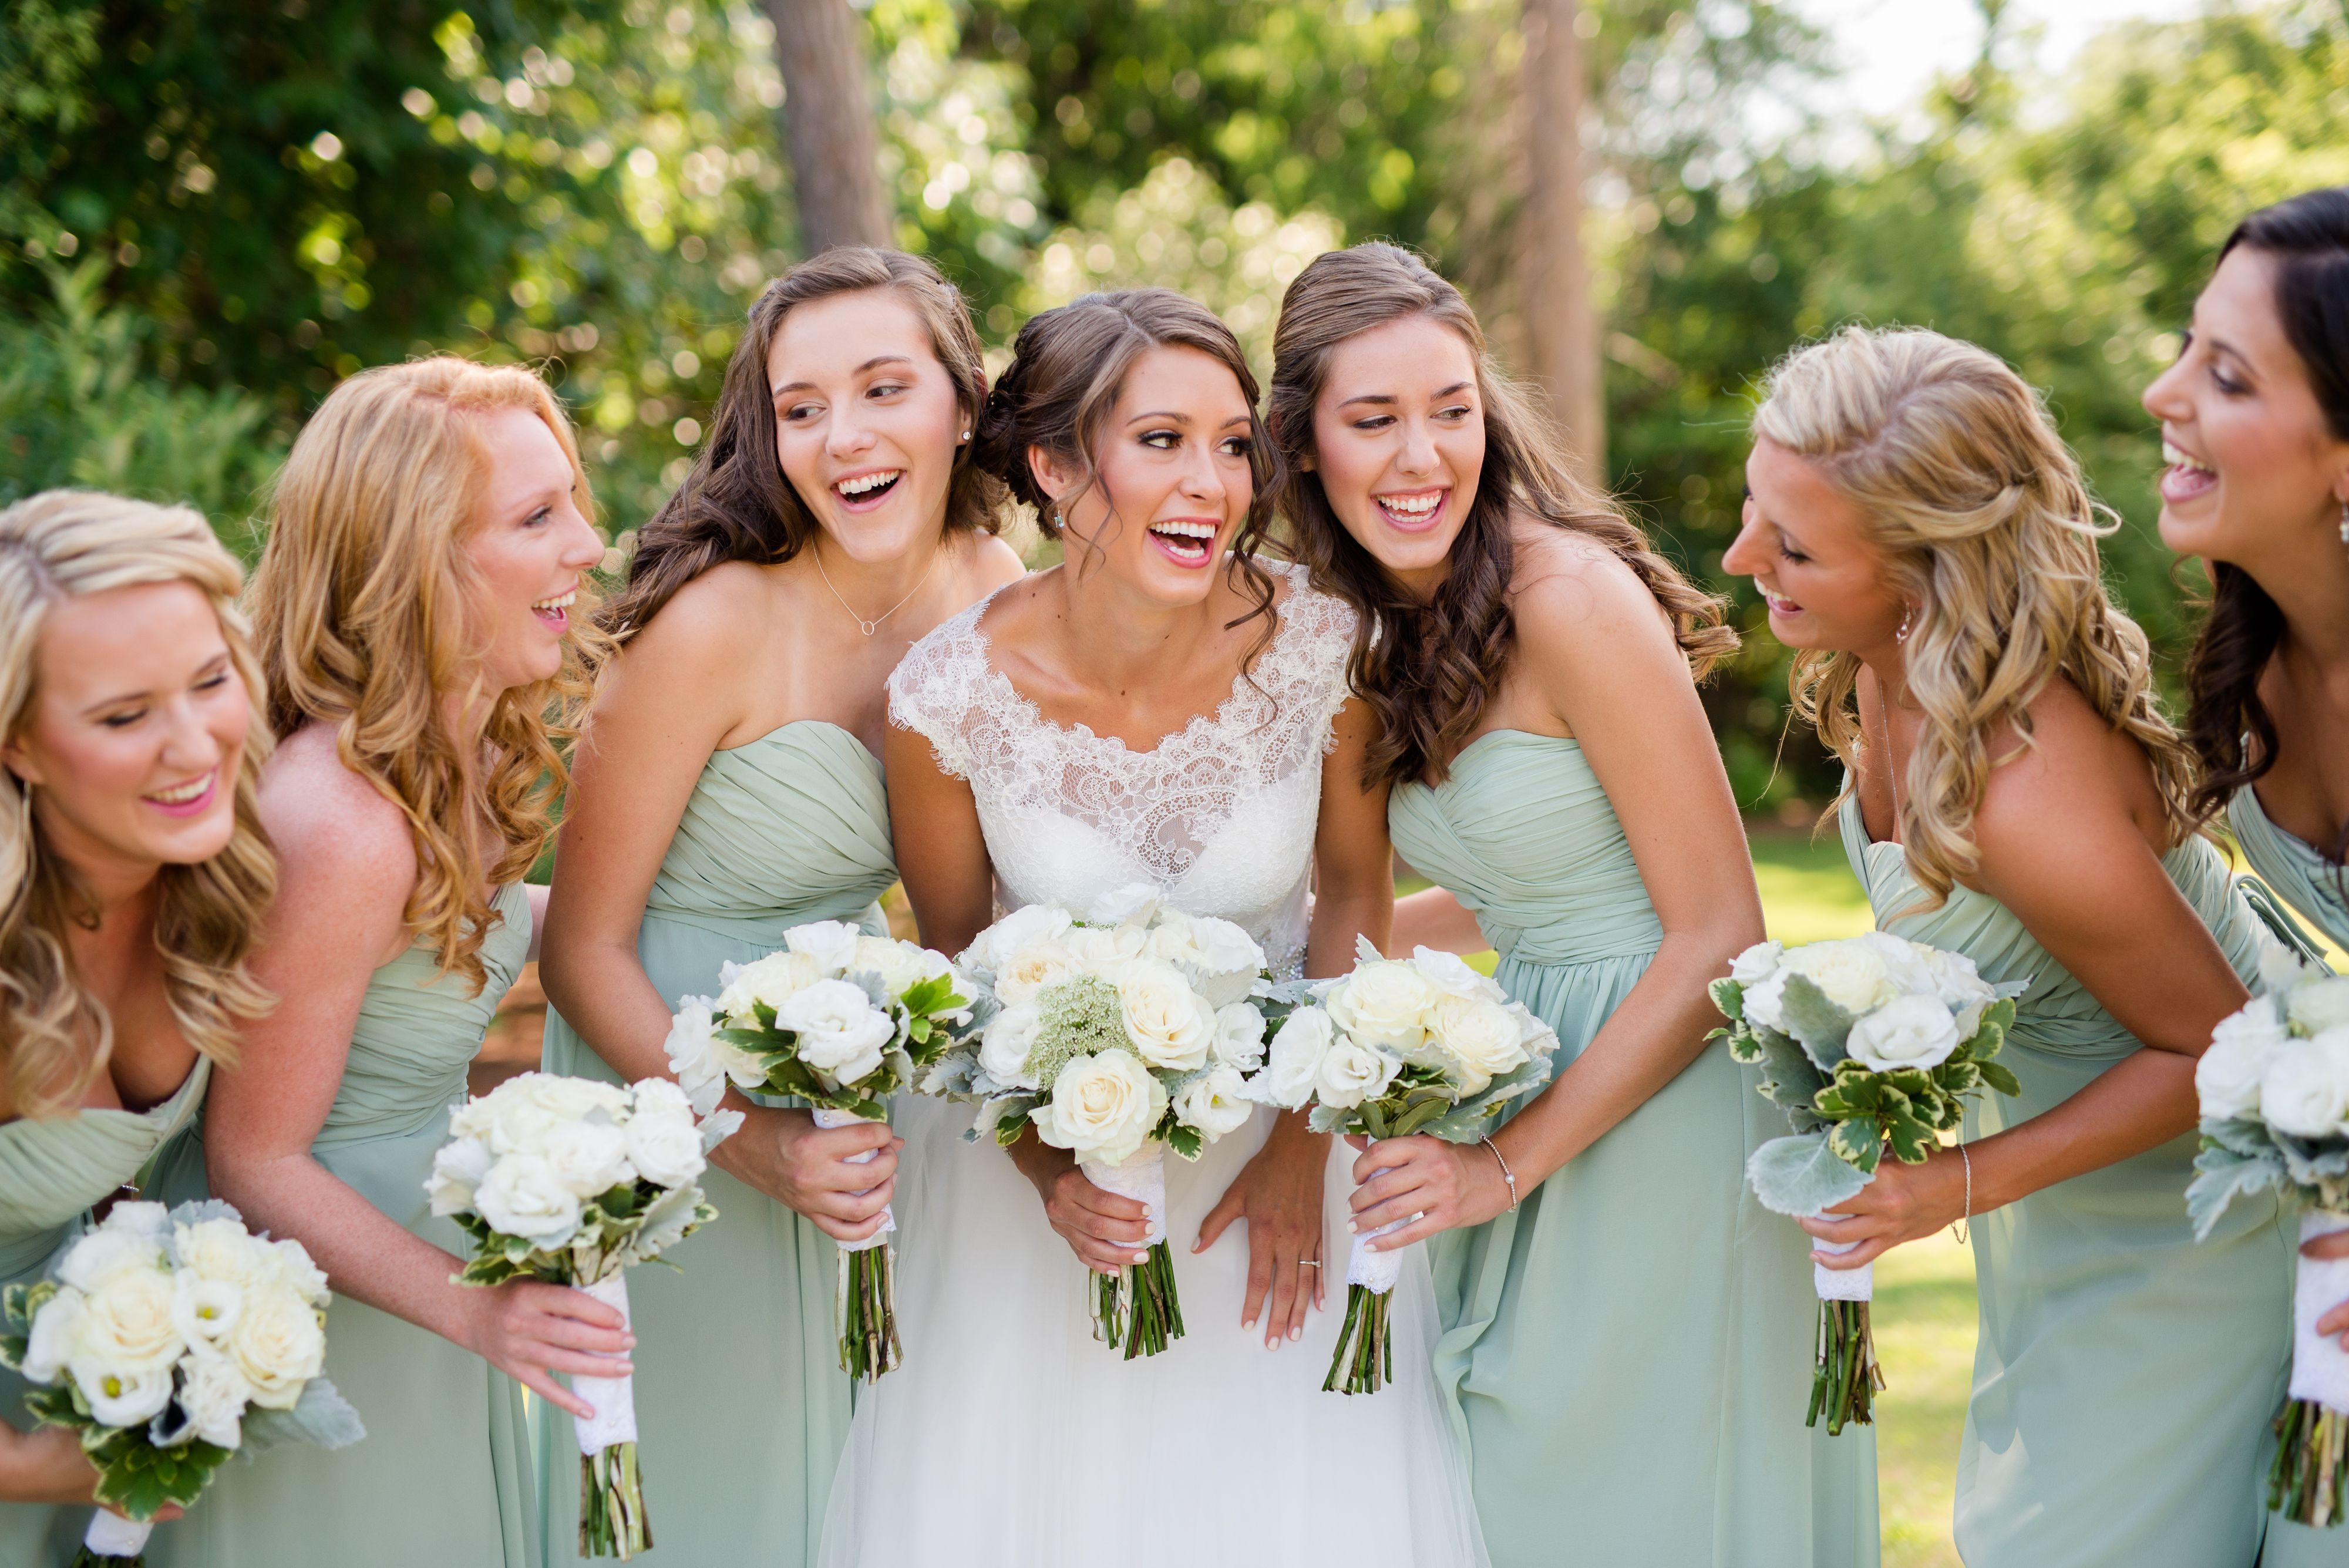 Bill levkoff sage chiffon bridesmaid dresses s and k get hitched bill levkoff sage chiffon bridesmaid dresses ombrellifo Image collections